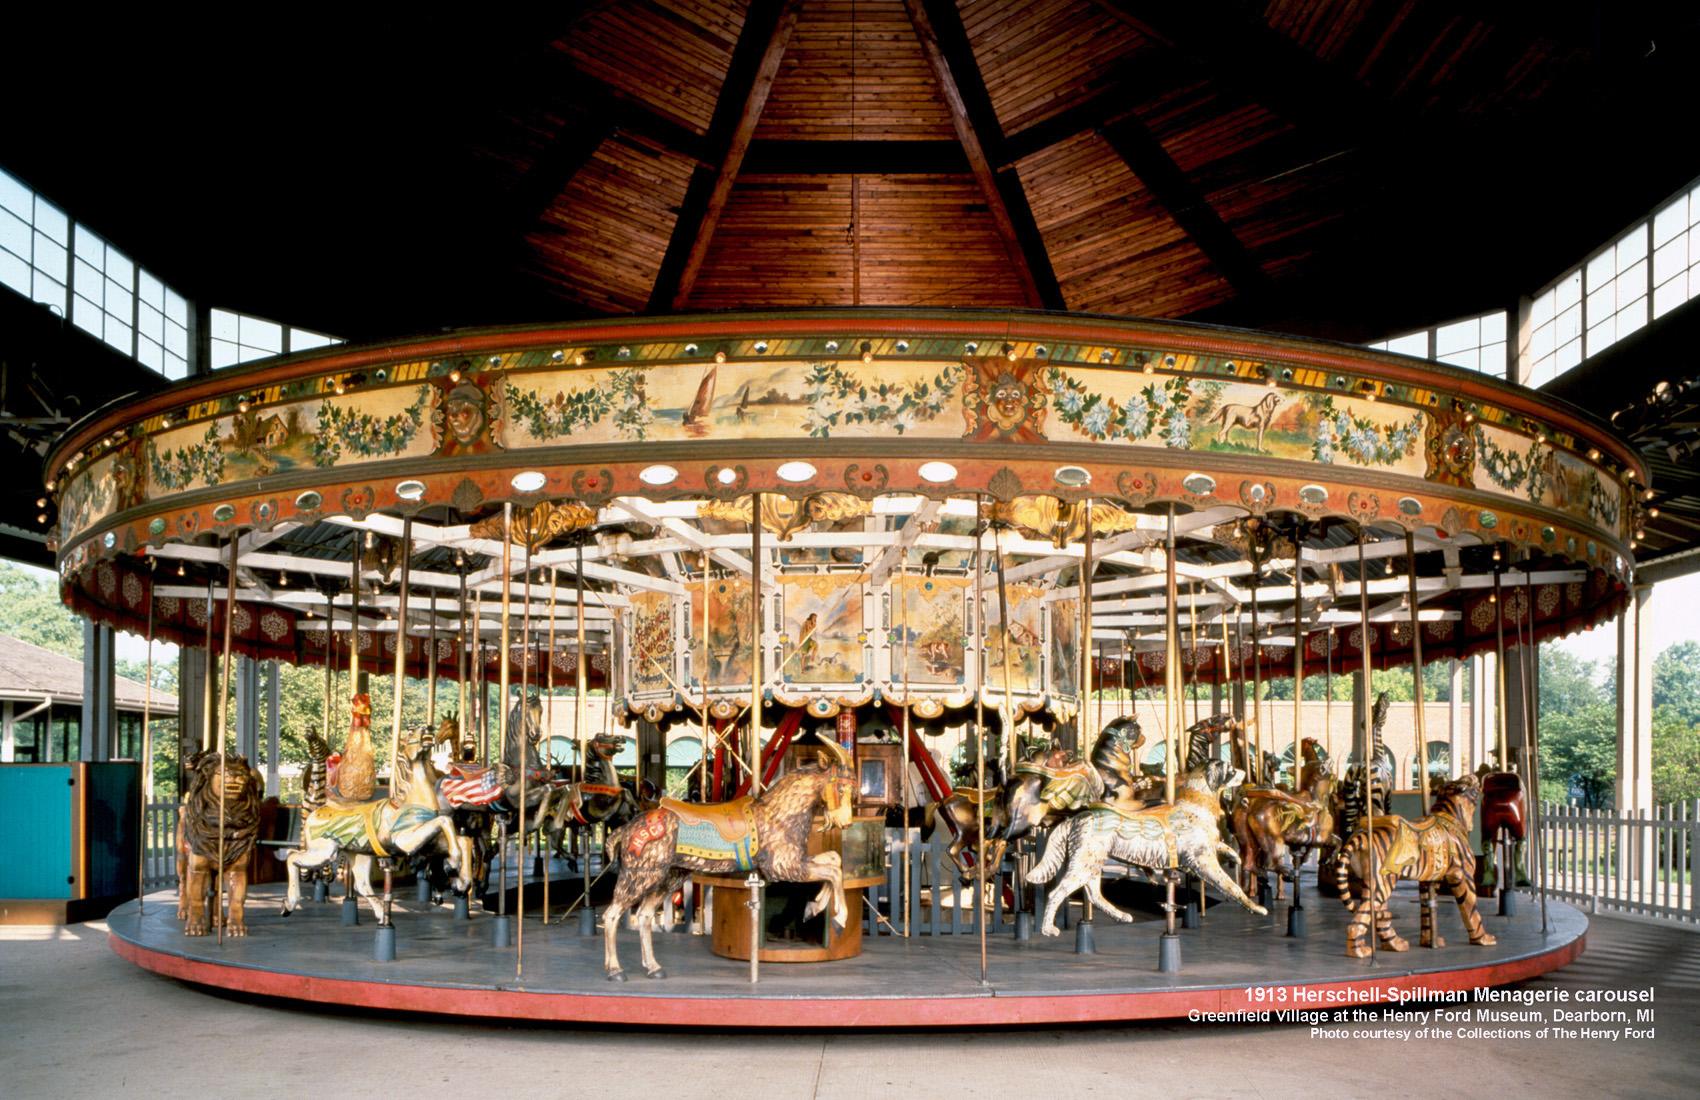 Historic-Herschell-Spillman-carousel-Greenfield-Village-MI-CNT-center-May-07